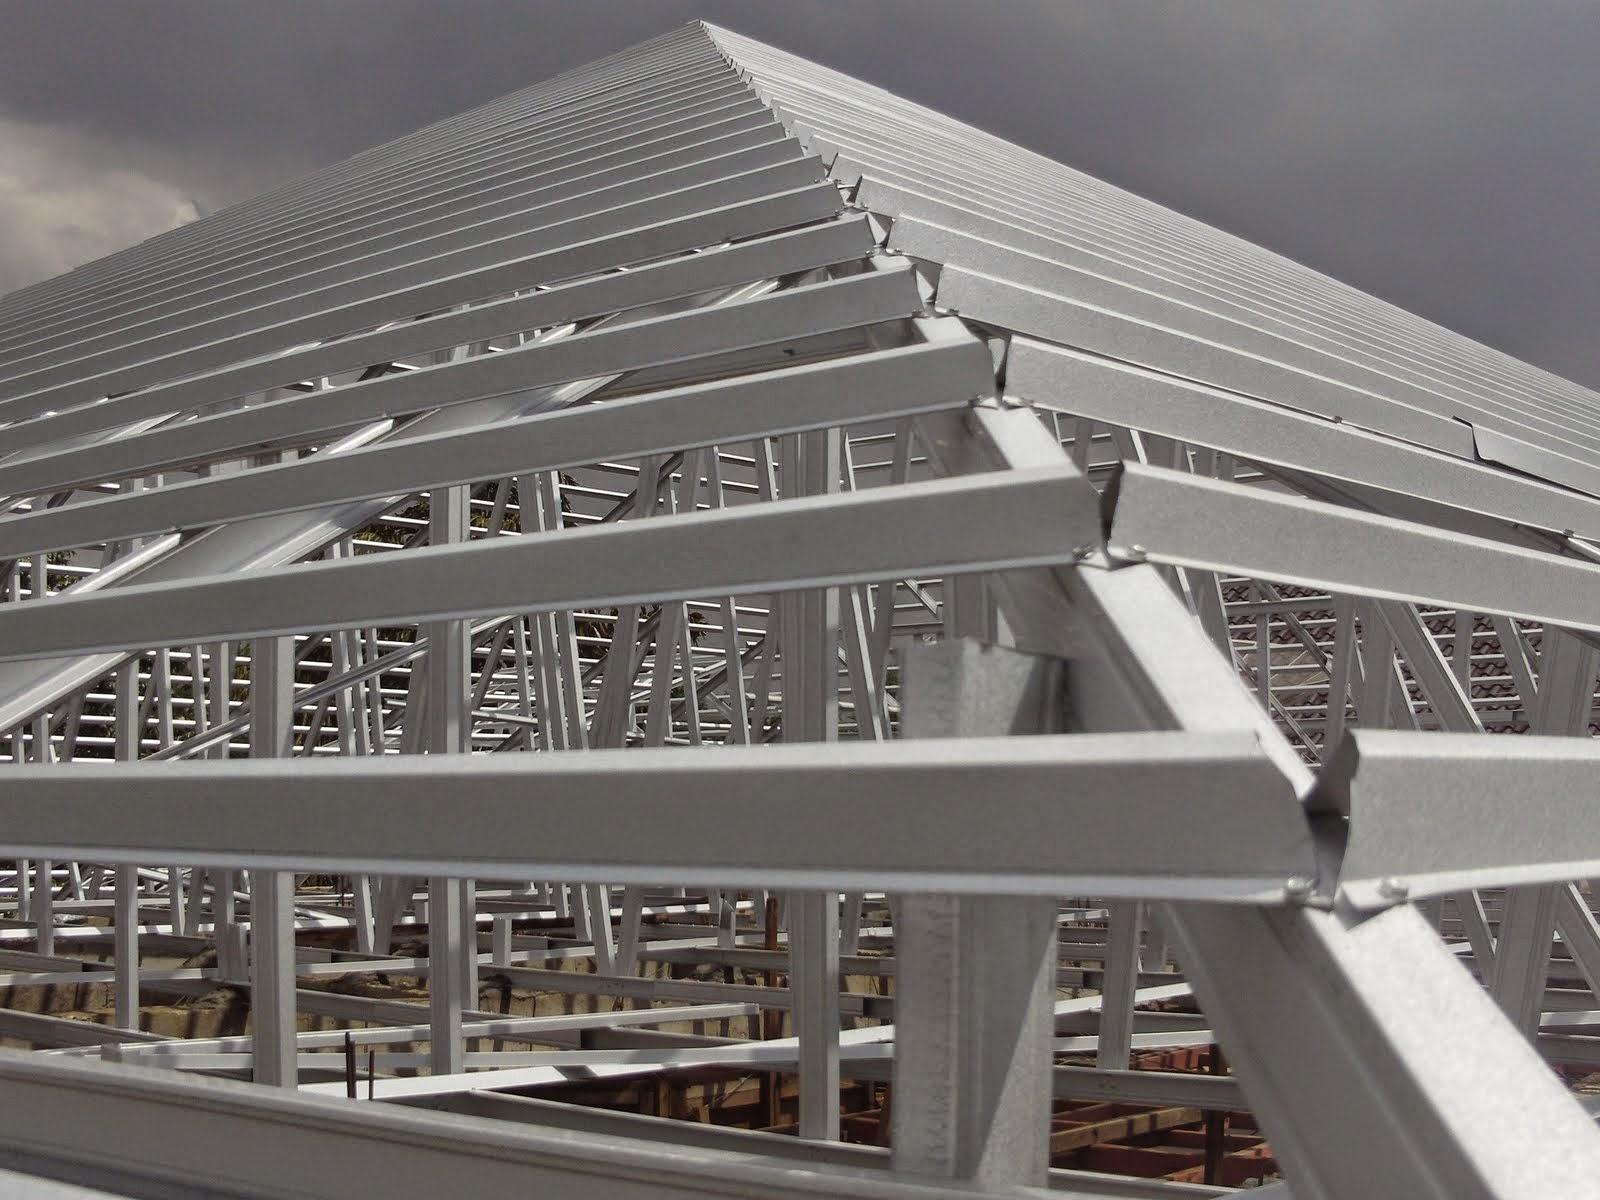 gambar rangka atap baja ringan limasan 6 kelebihan dari konstruksi dan perkiraan biayanya